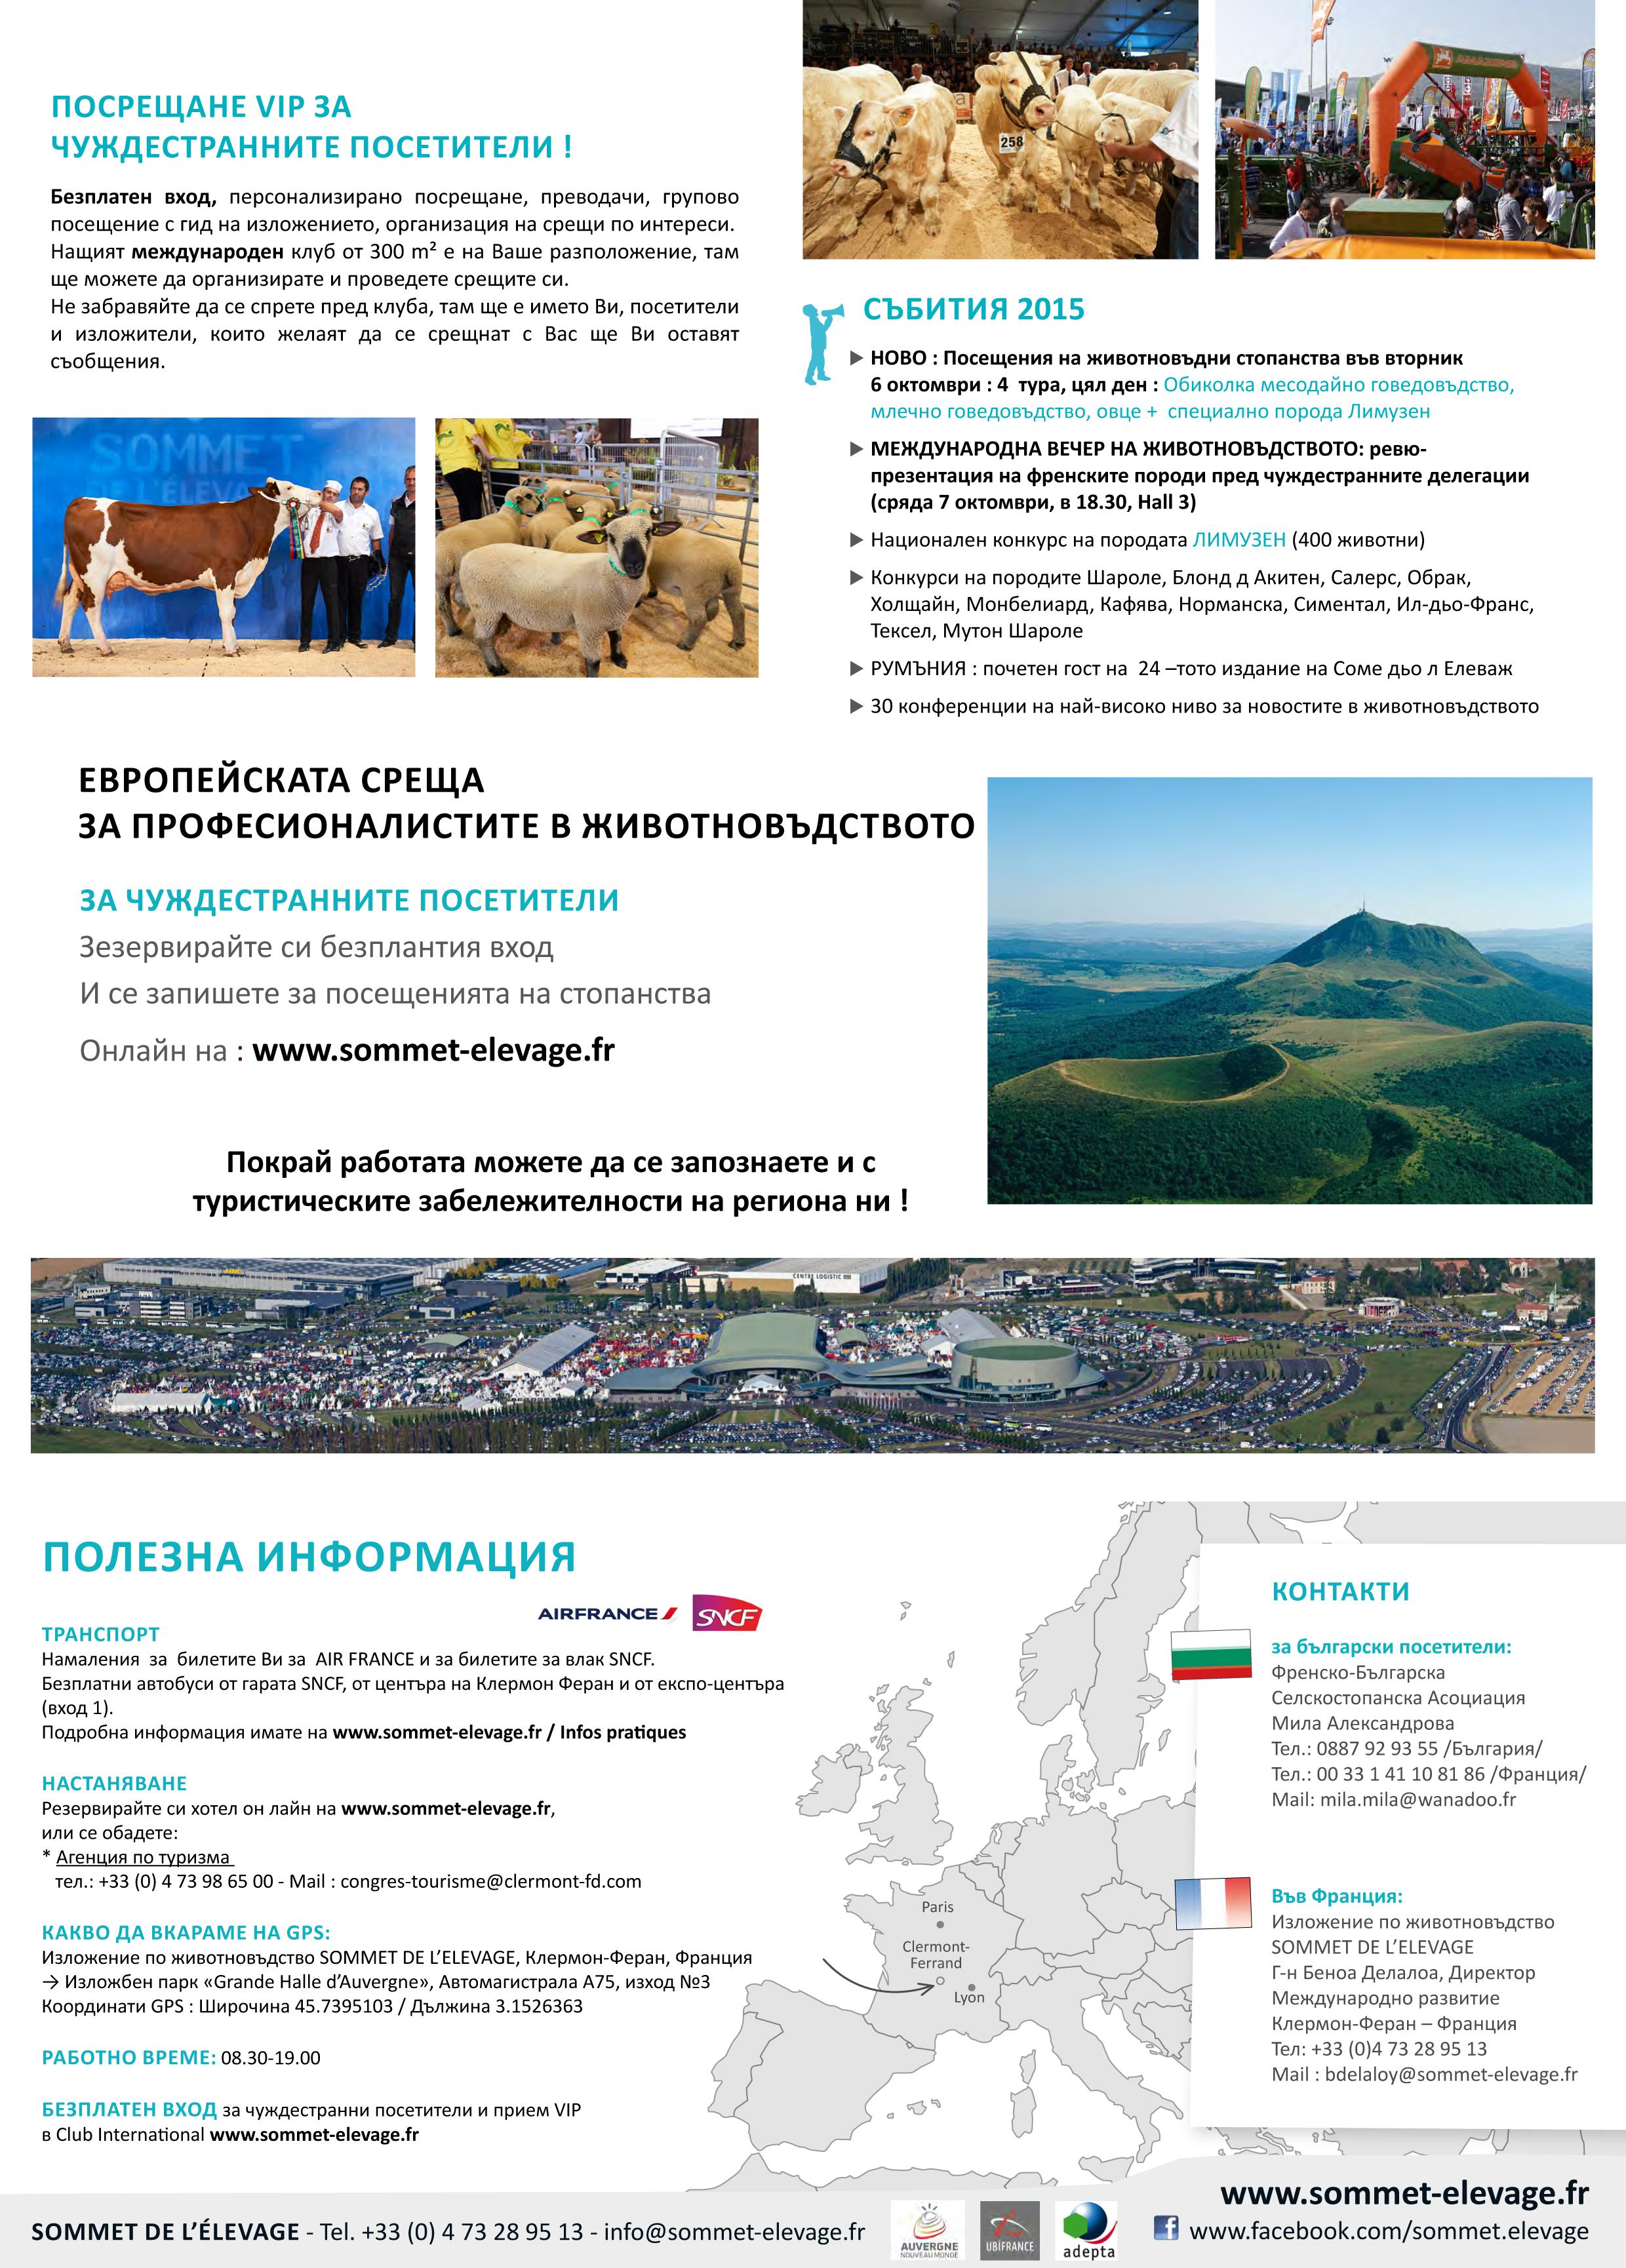 SOMMET DE L'ELEVAGE 2015 - Bulgarie-2